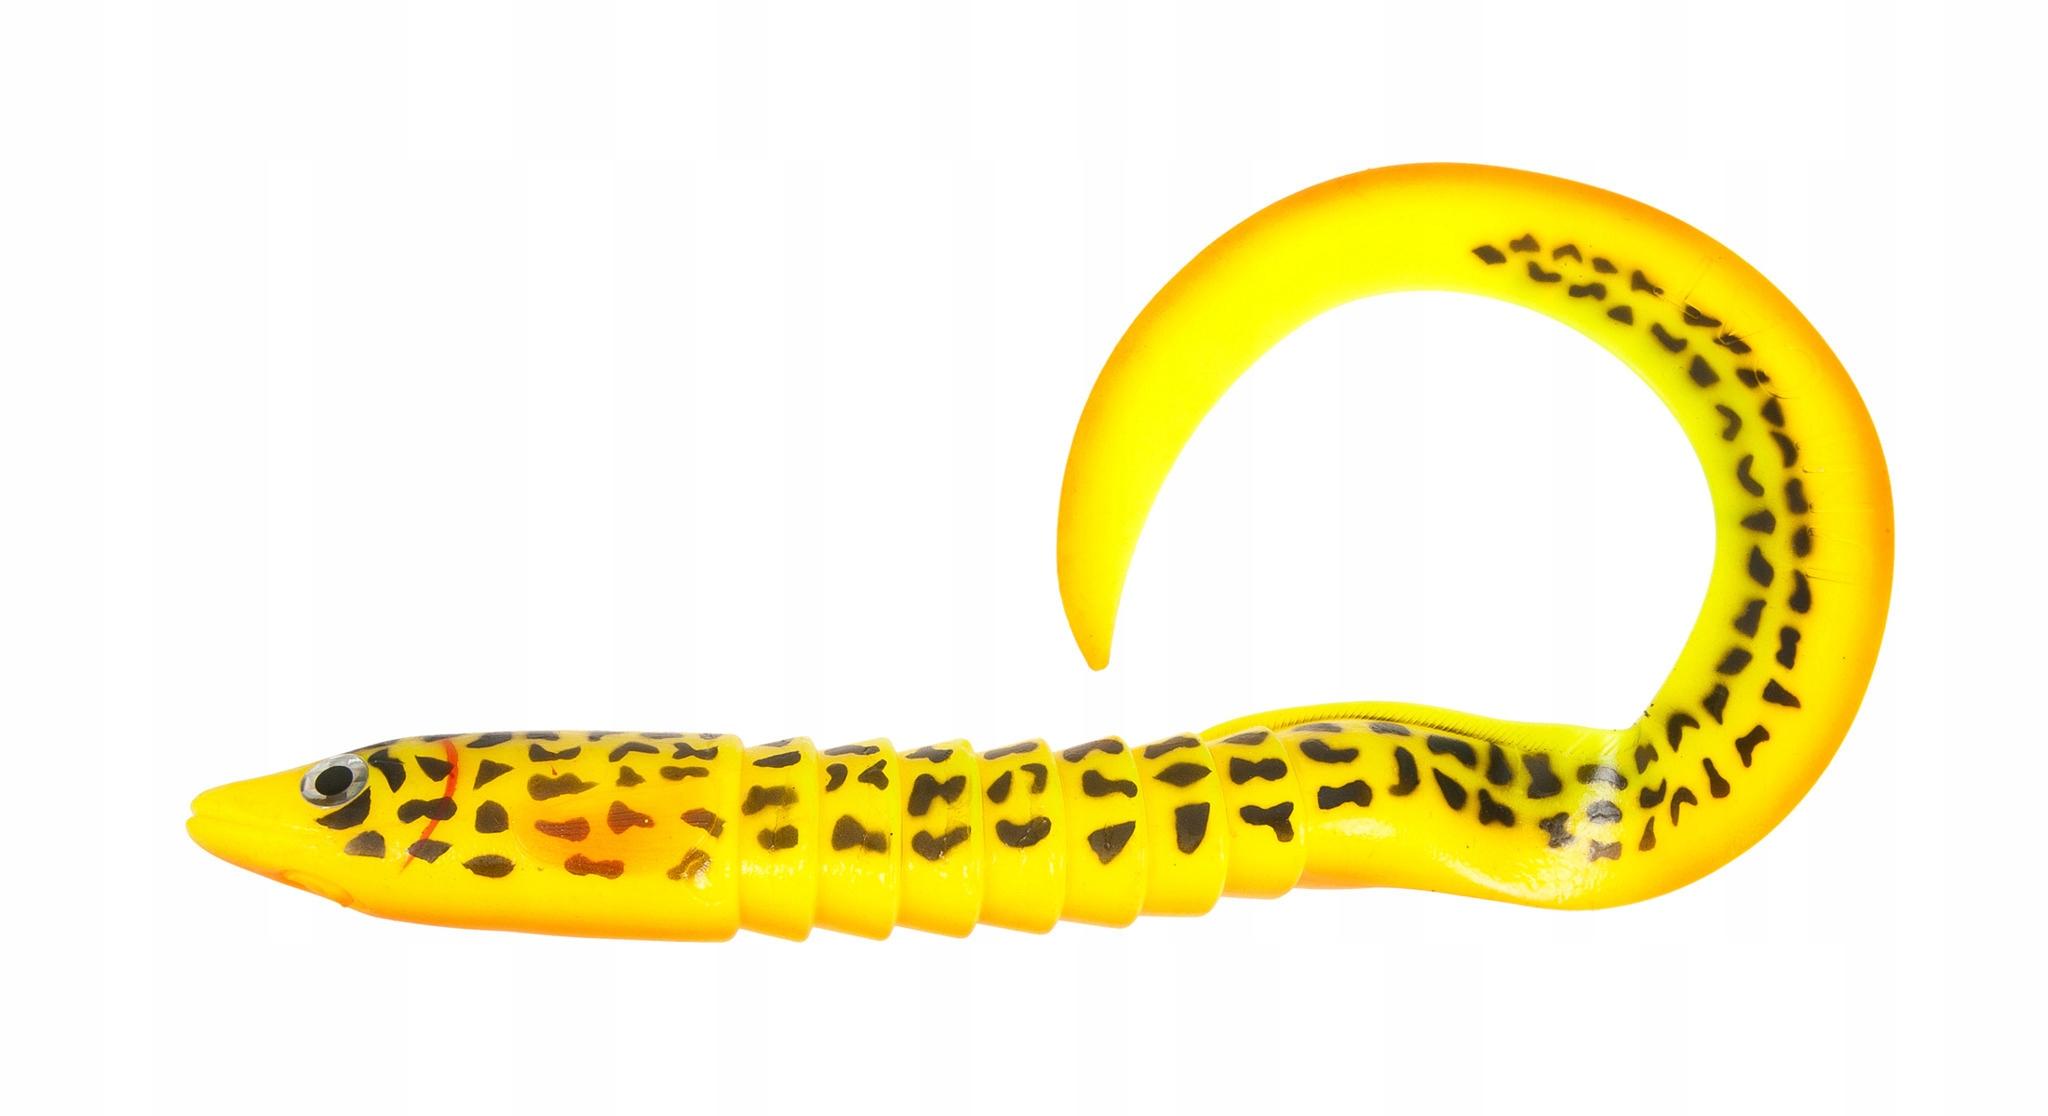 Sanger veľký twister pre sumu / halibut FS-38,0 cm